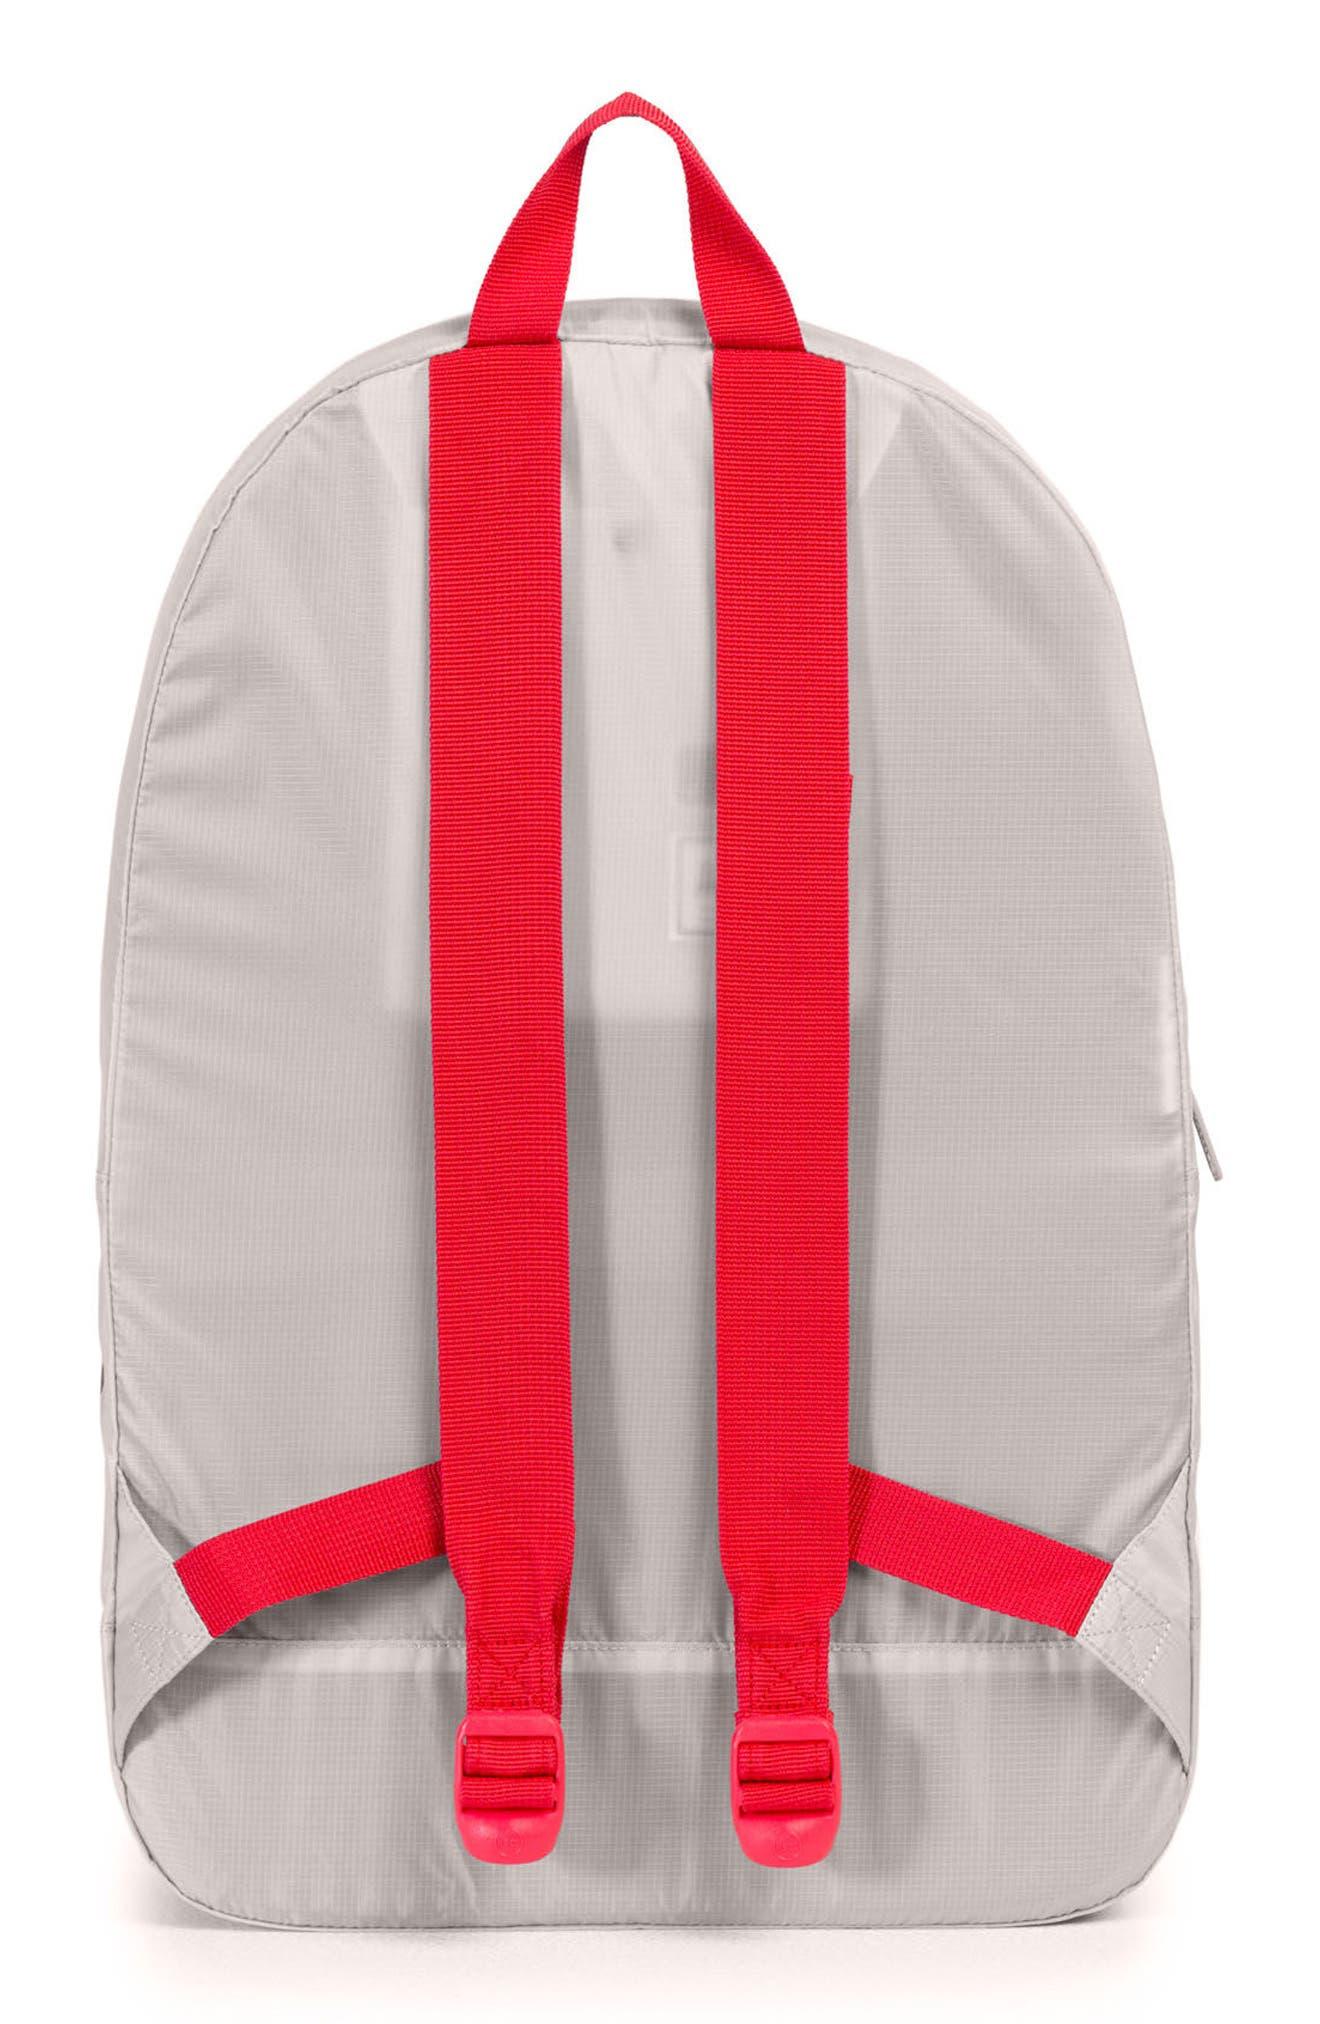 Packable - MLB National League Backpack,                             Alternate thumbnail 2, color,                             CINCINNATI REDS